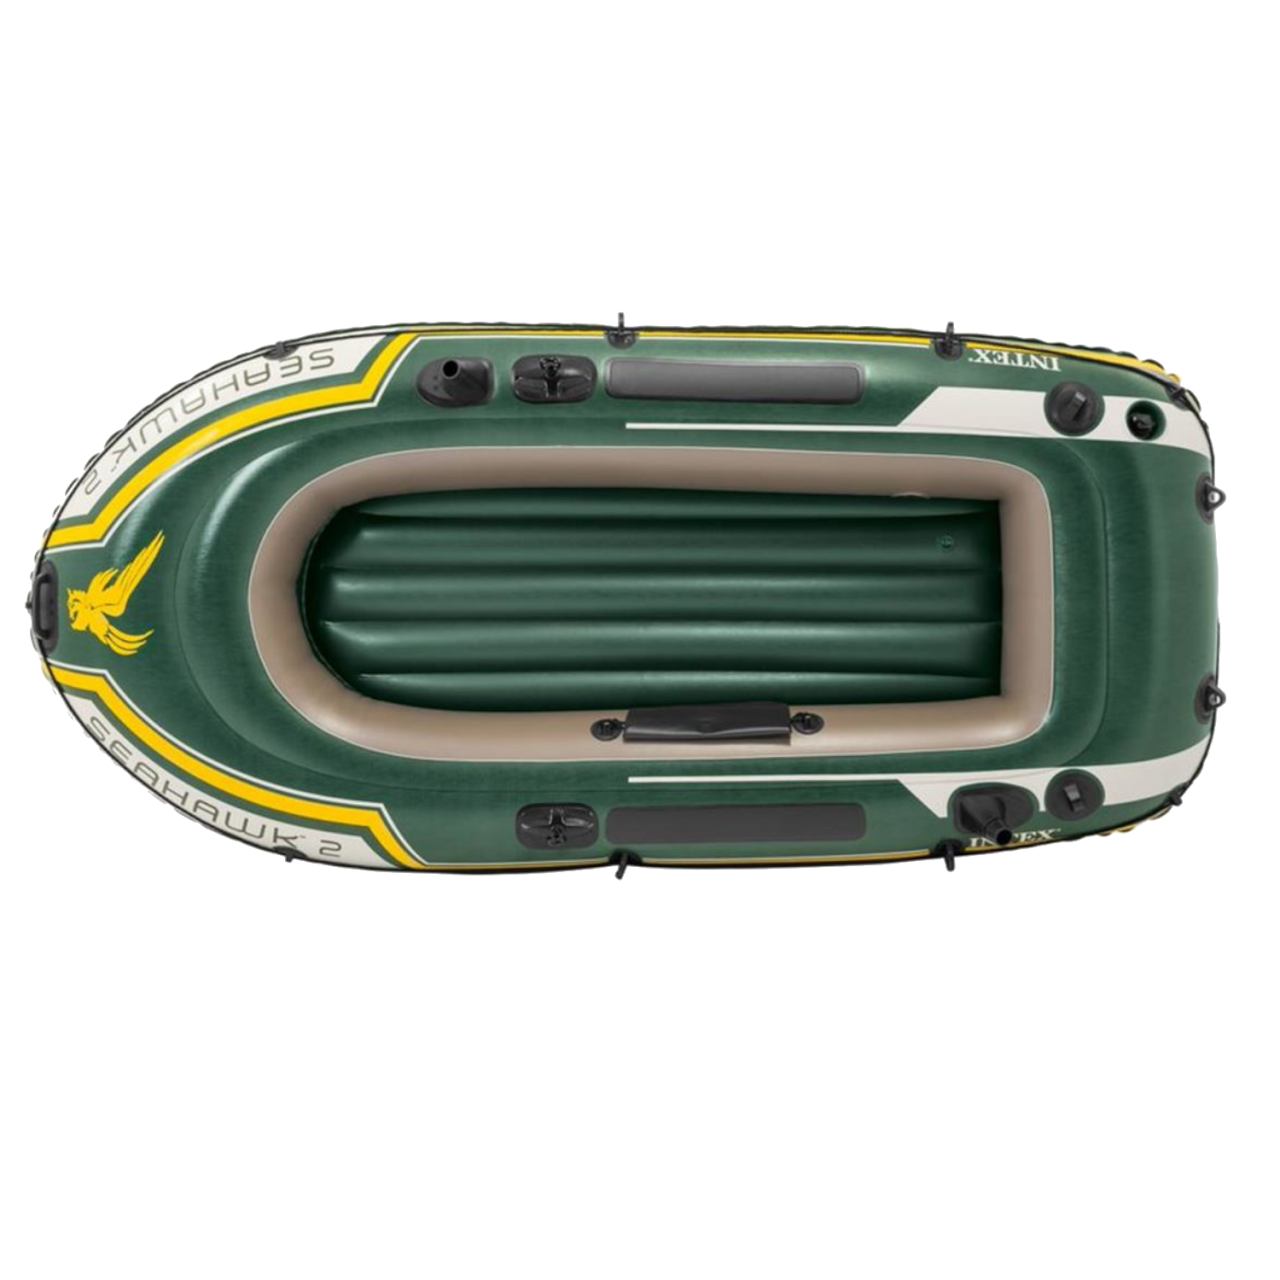 Intex 68347 Schlauchboot Set Seahawk 2 Ruderboot Angelboot +Paddel Pumpe